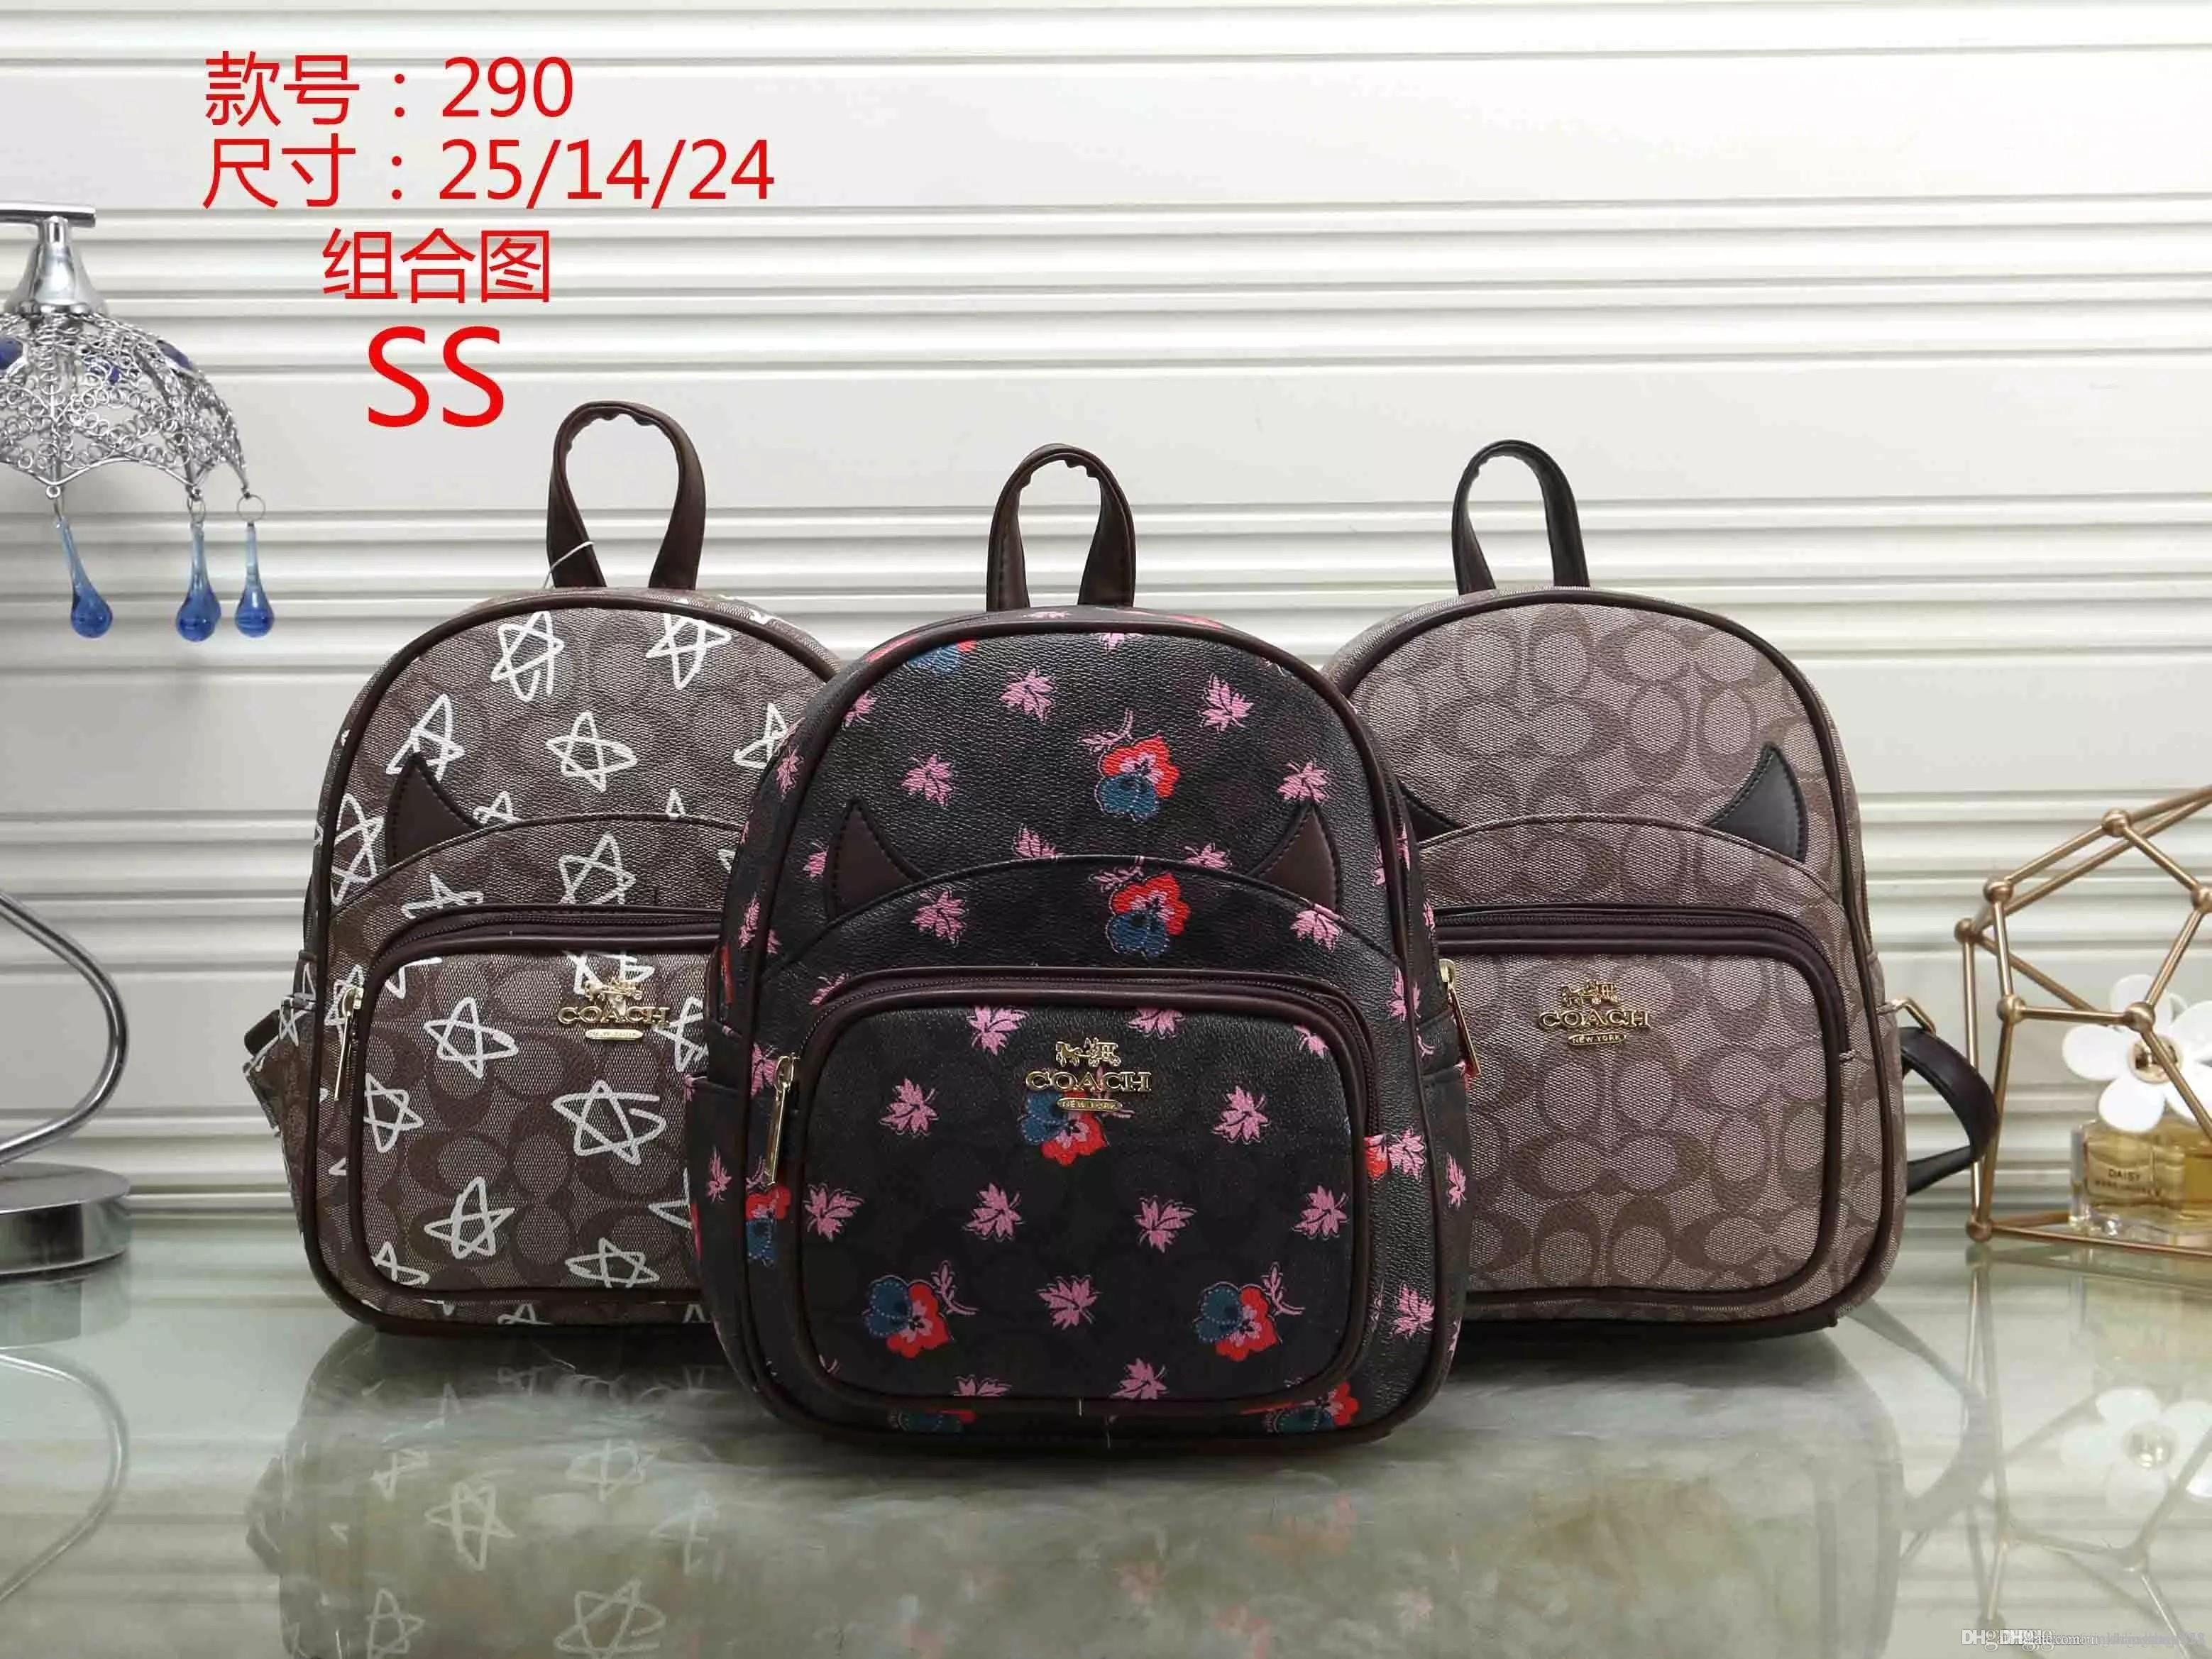 054b42afdc 2019 MK 290 SS NEW Styles Fashion Bags Ladies Handbags Designer Bags Women  Tote Bag Luxury Brands Bags Single Shoulder Bag From Jiashigangwan1111